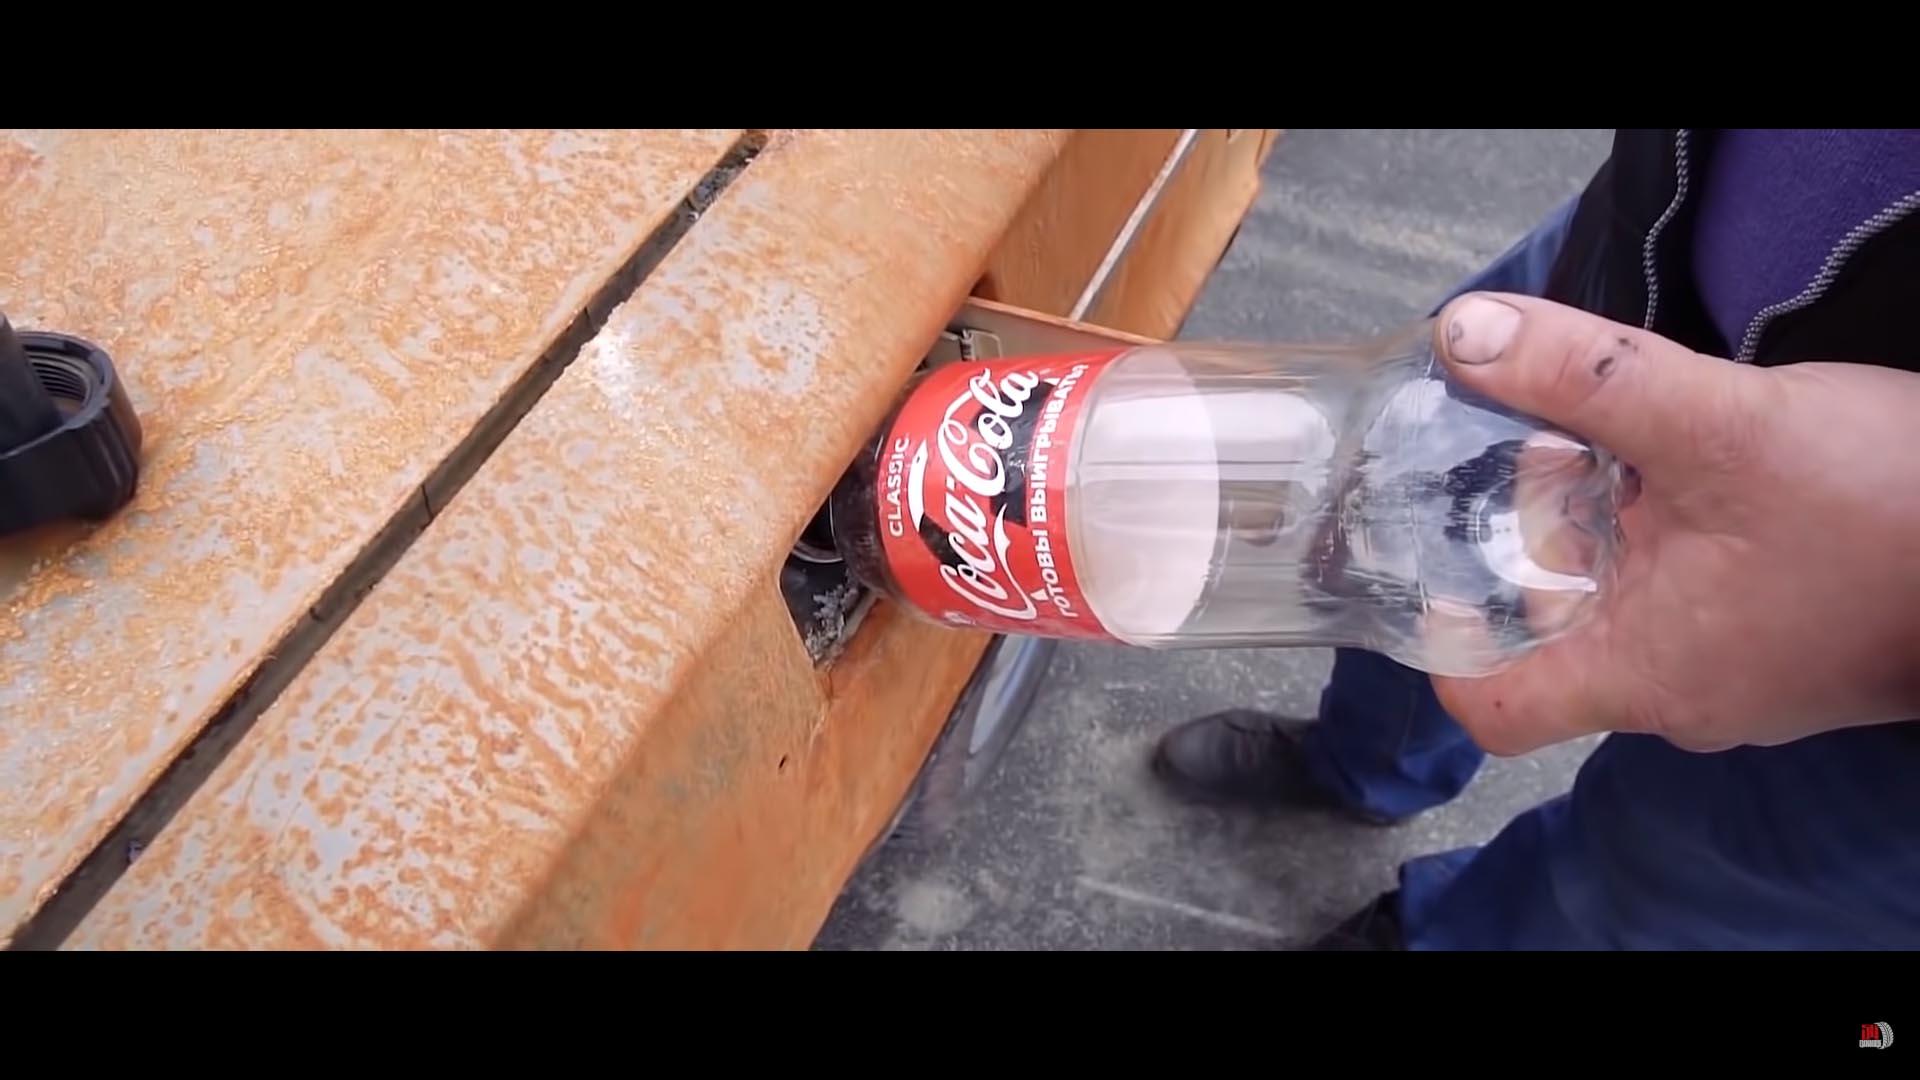 Photo of Τι θα γίνει αν αδειάσει ένα μπουκάλι Coca-Cola στο ρεζερβουάρ ενός Lada; [vid]